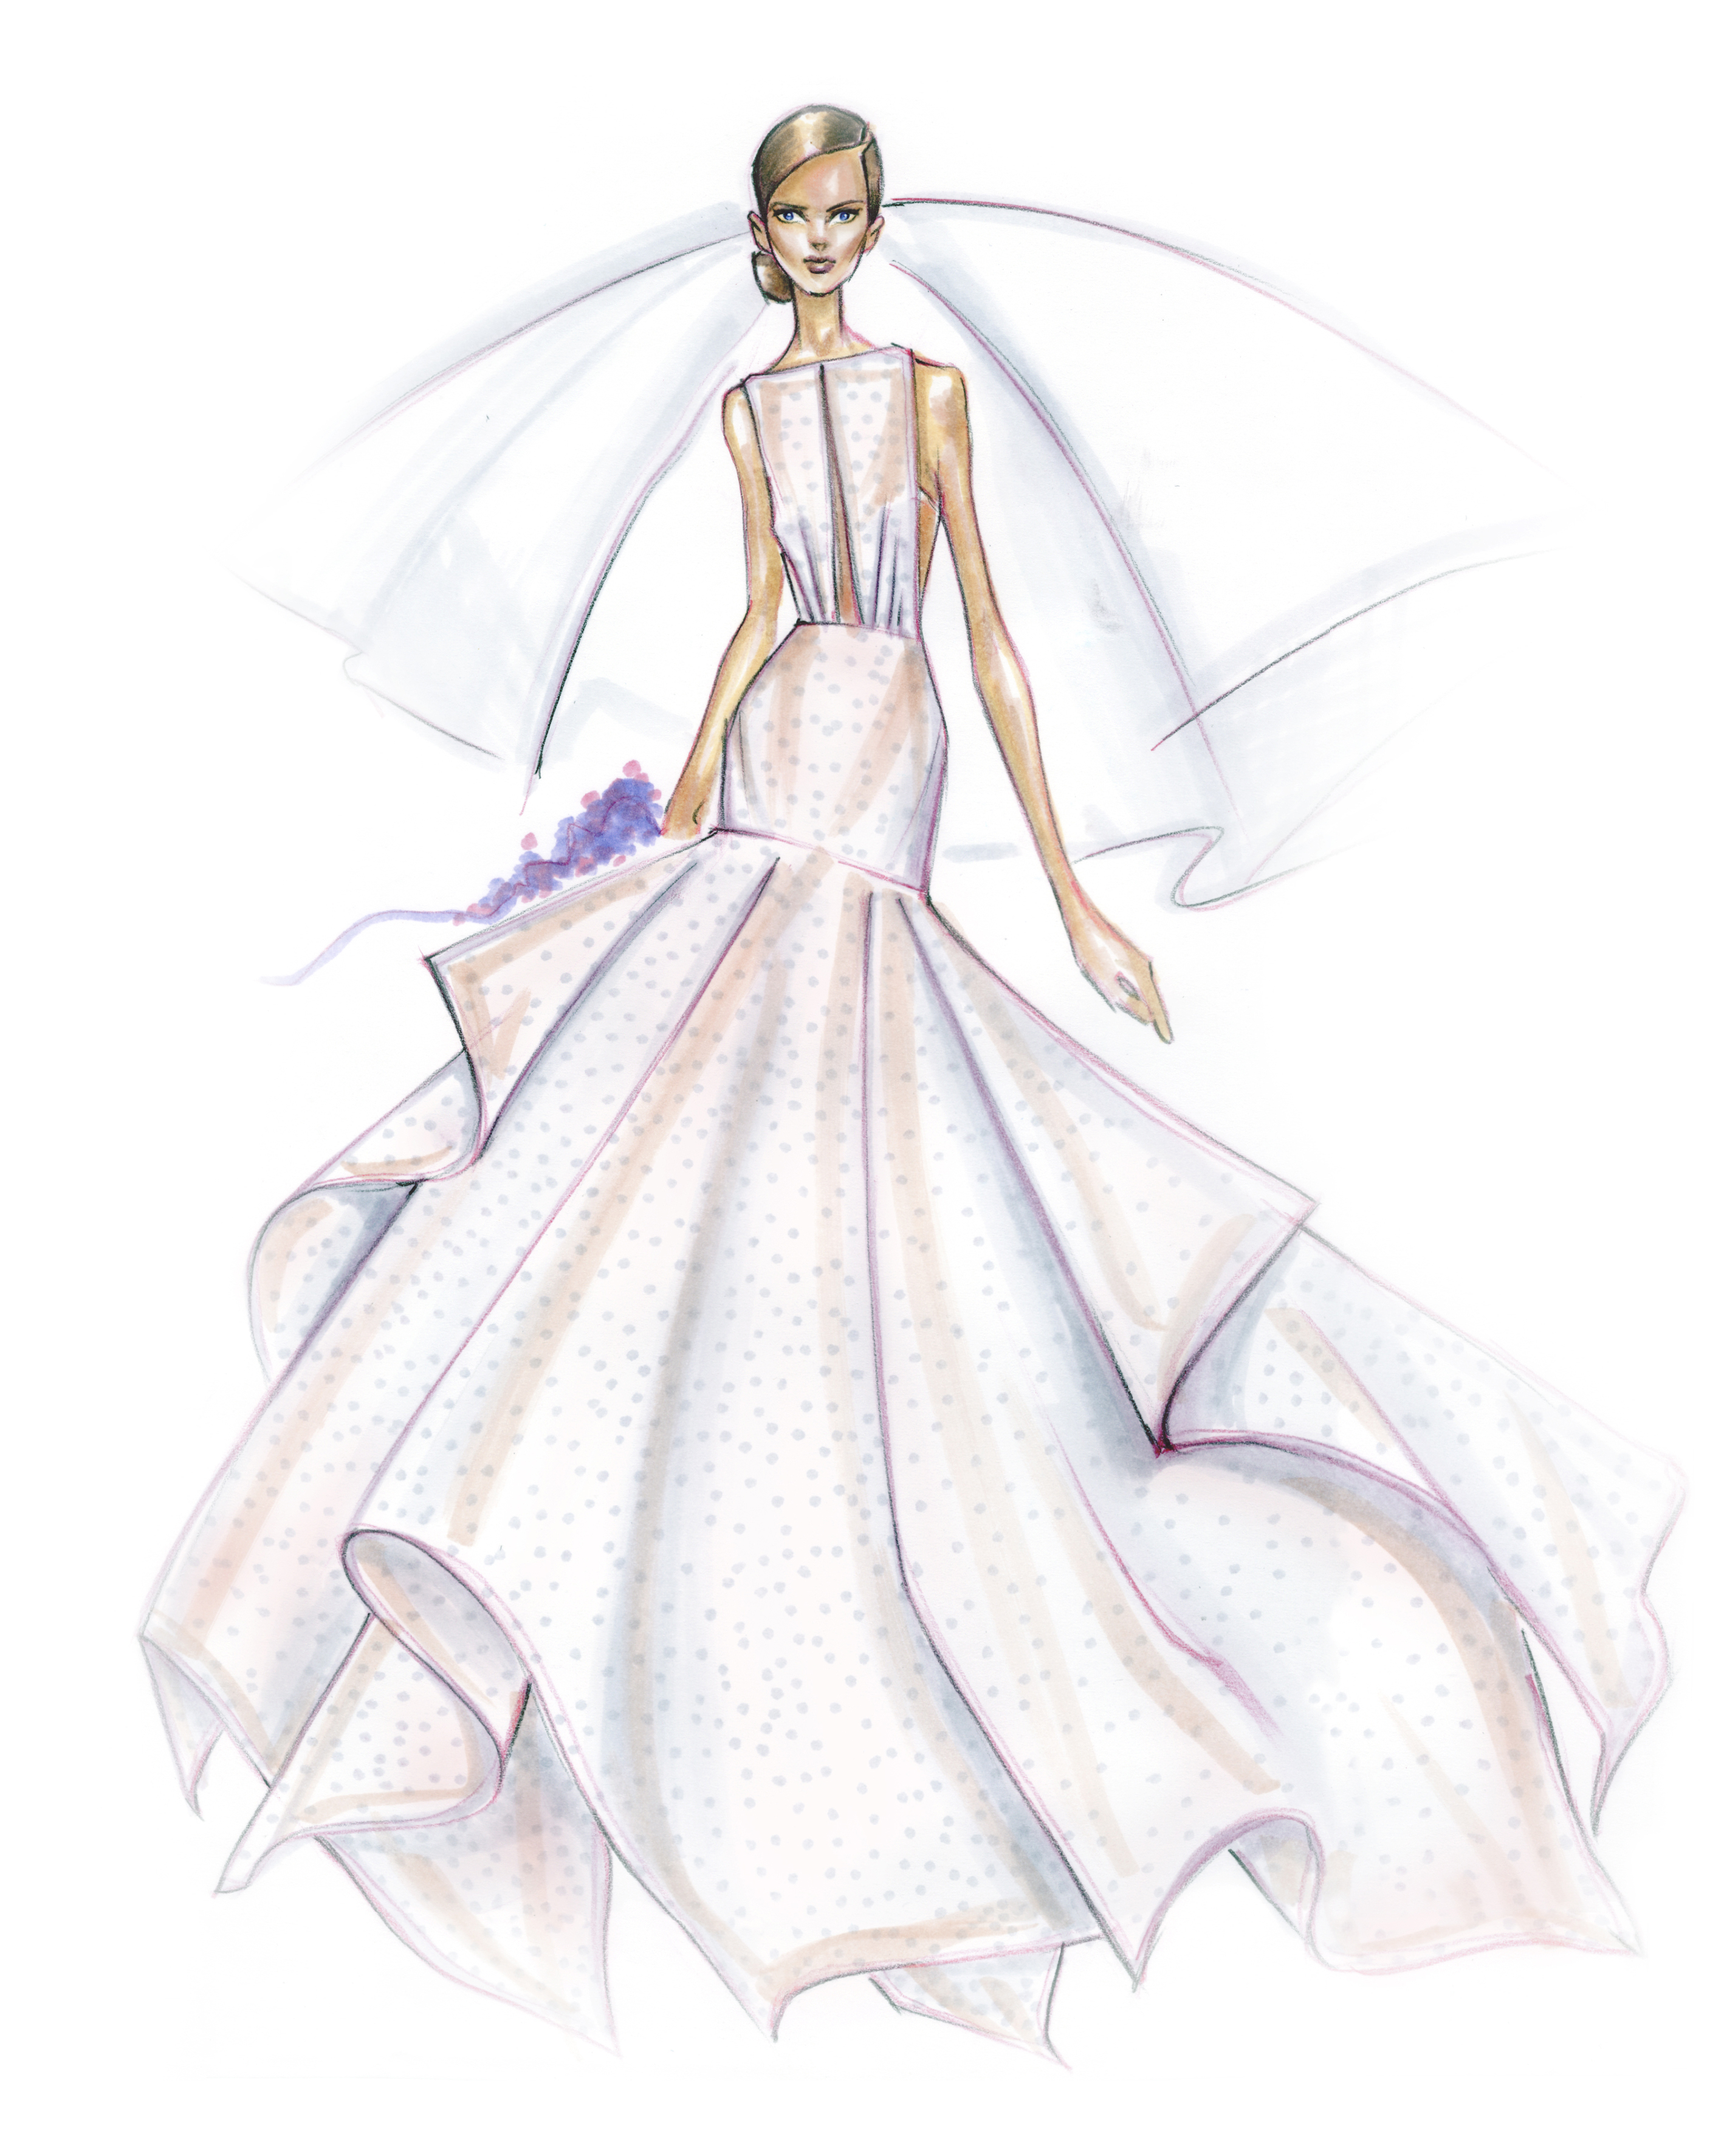 bridal-market-inspiration-angel-sanchez-0415.jpg